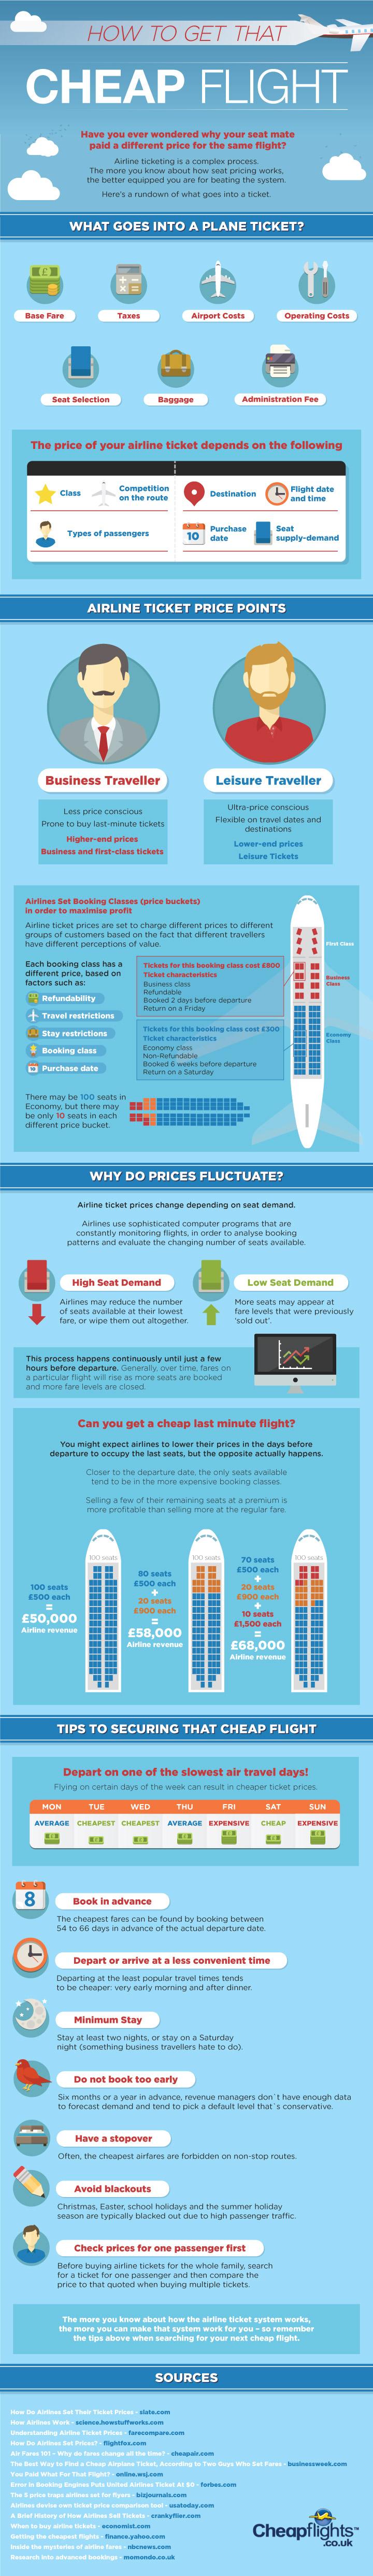 How to get a cheap flight